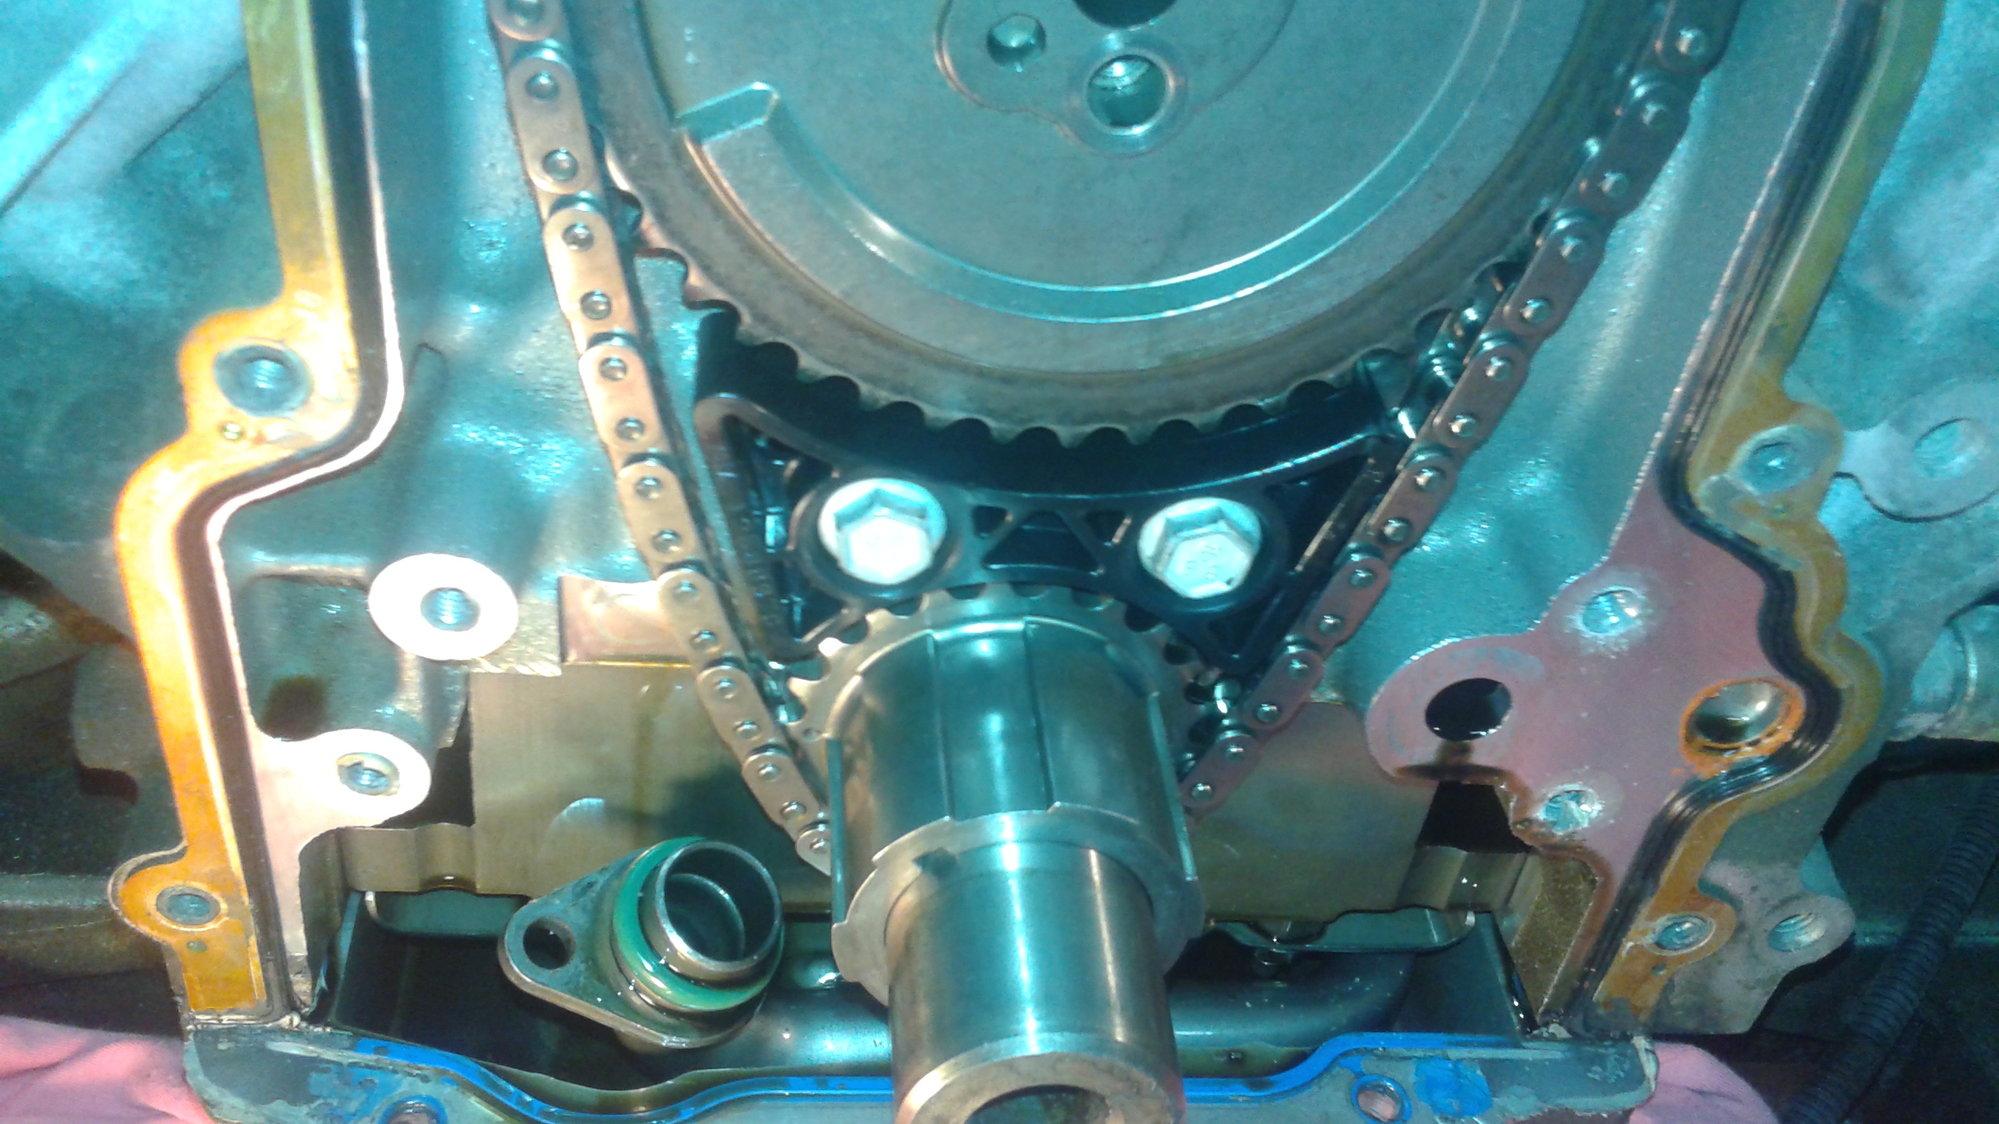 ls3 timing chain tensioner problem - LS1TECH - Camaro and Firebird